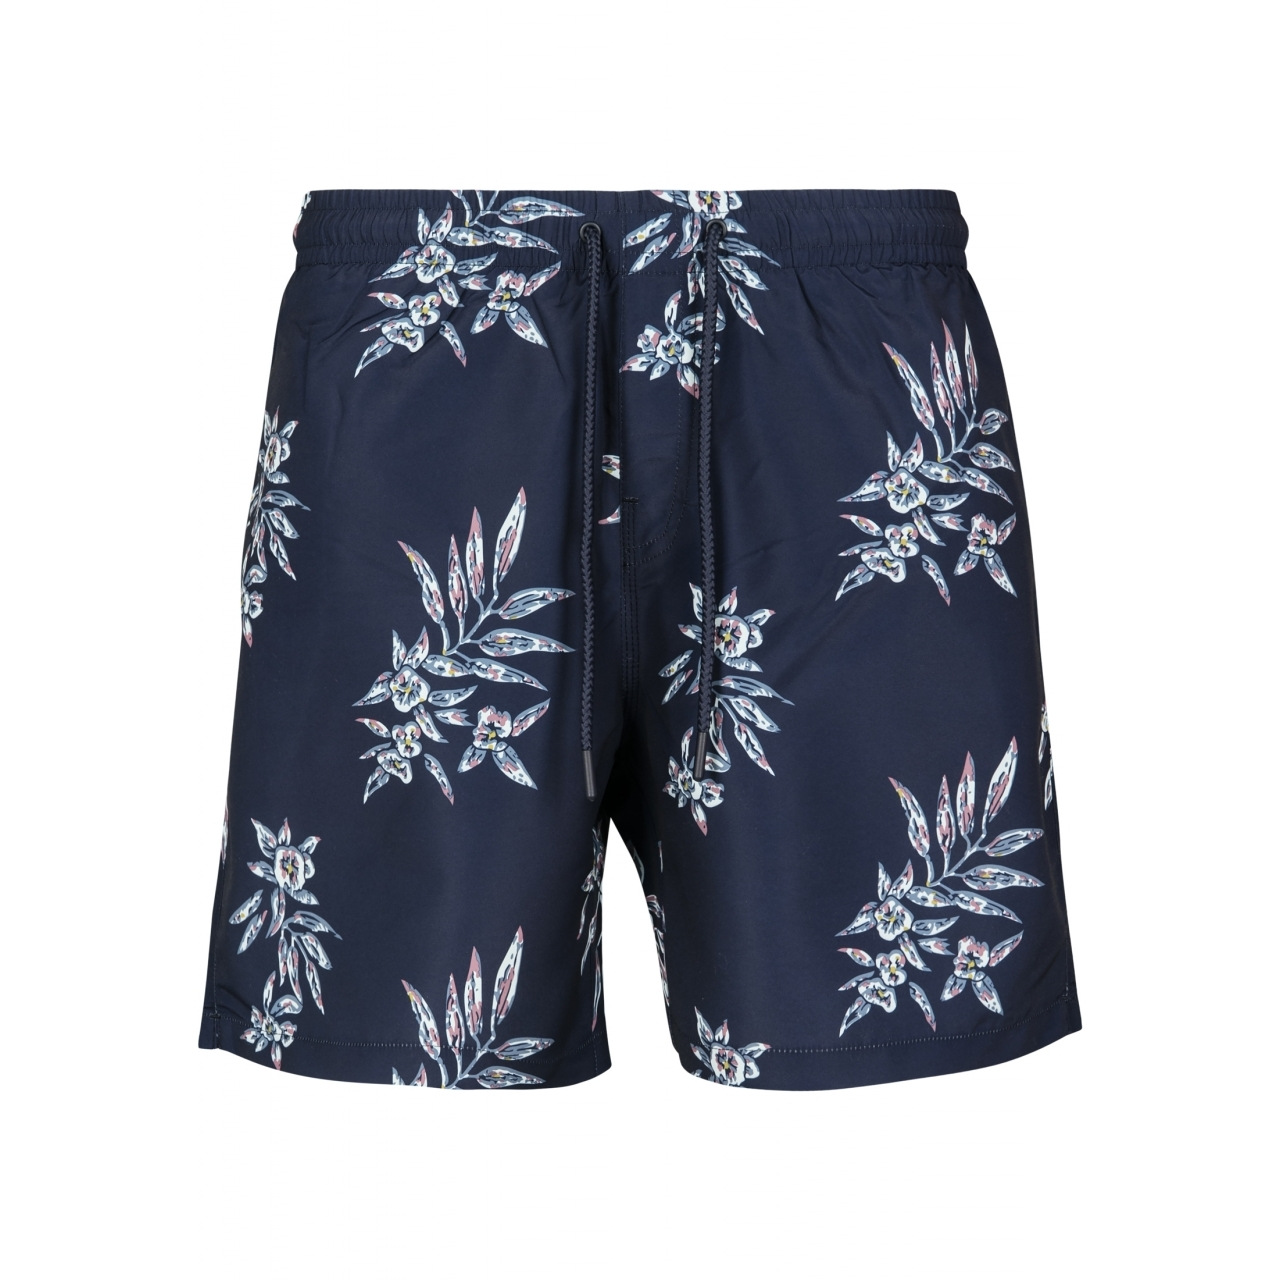 Plavky Urban Classics Pattern Floral - navy, XL